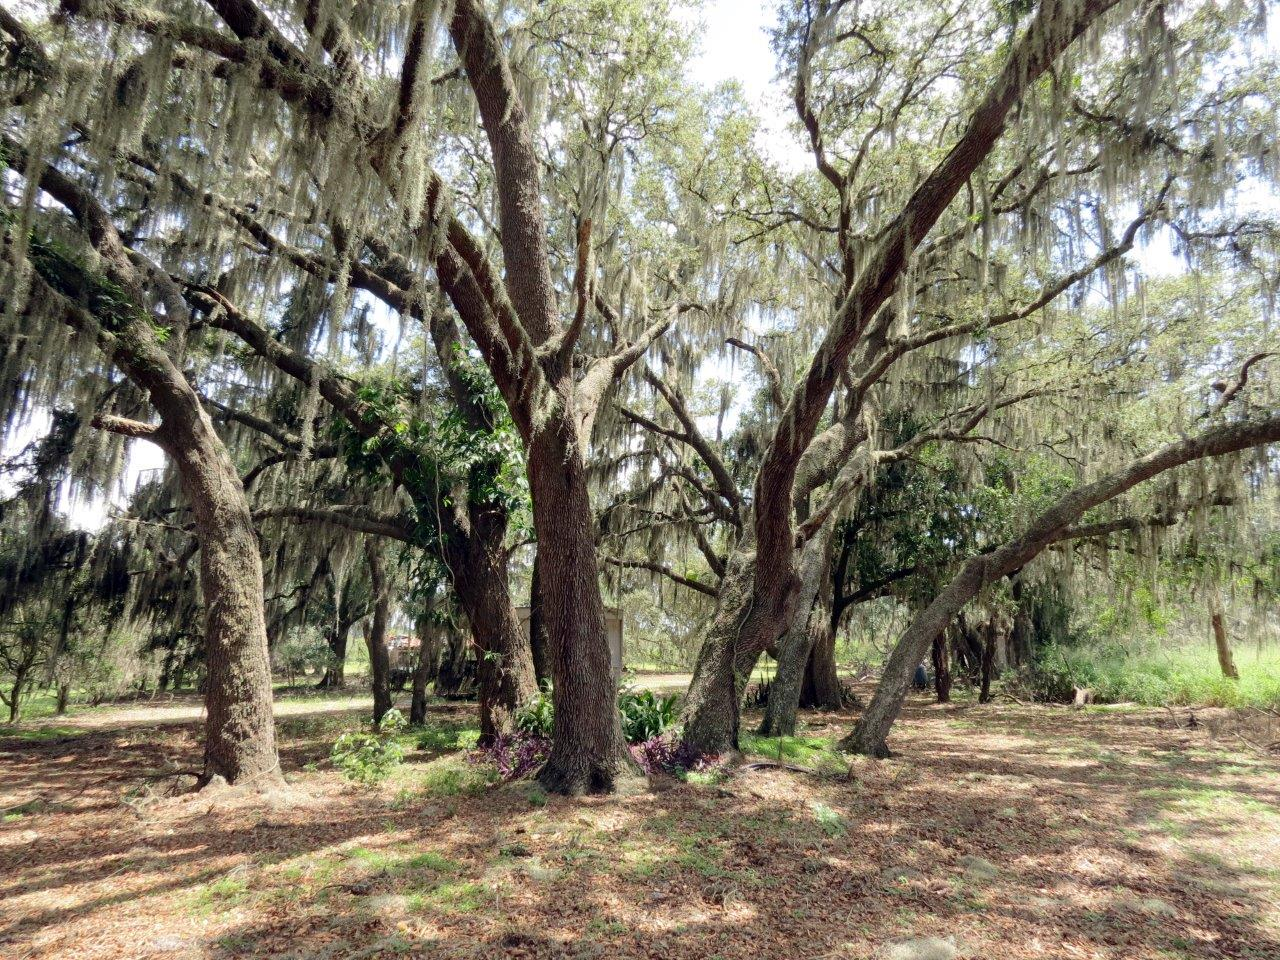 Manatee Preserve Grove & Retreat 70 Acres in Duette, Florida